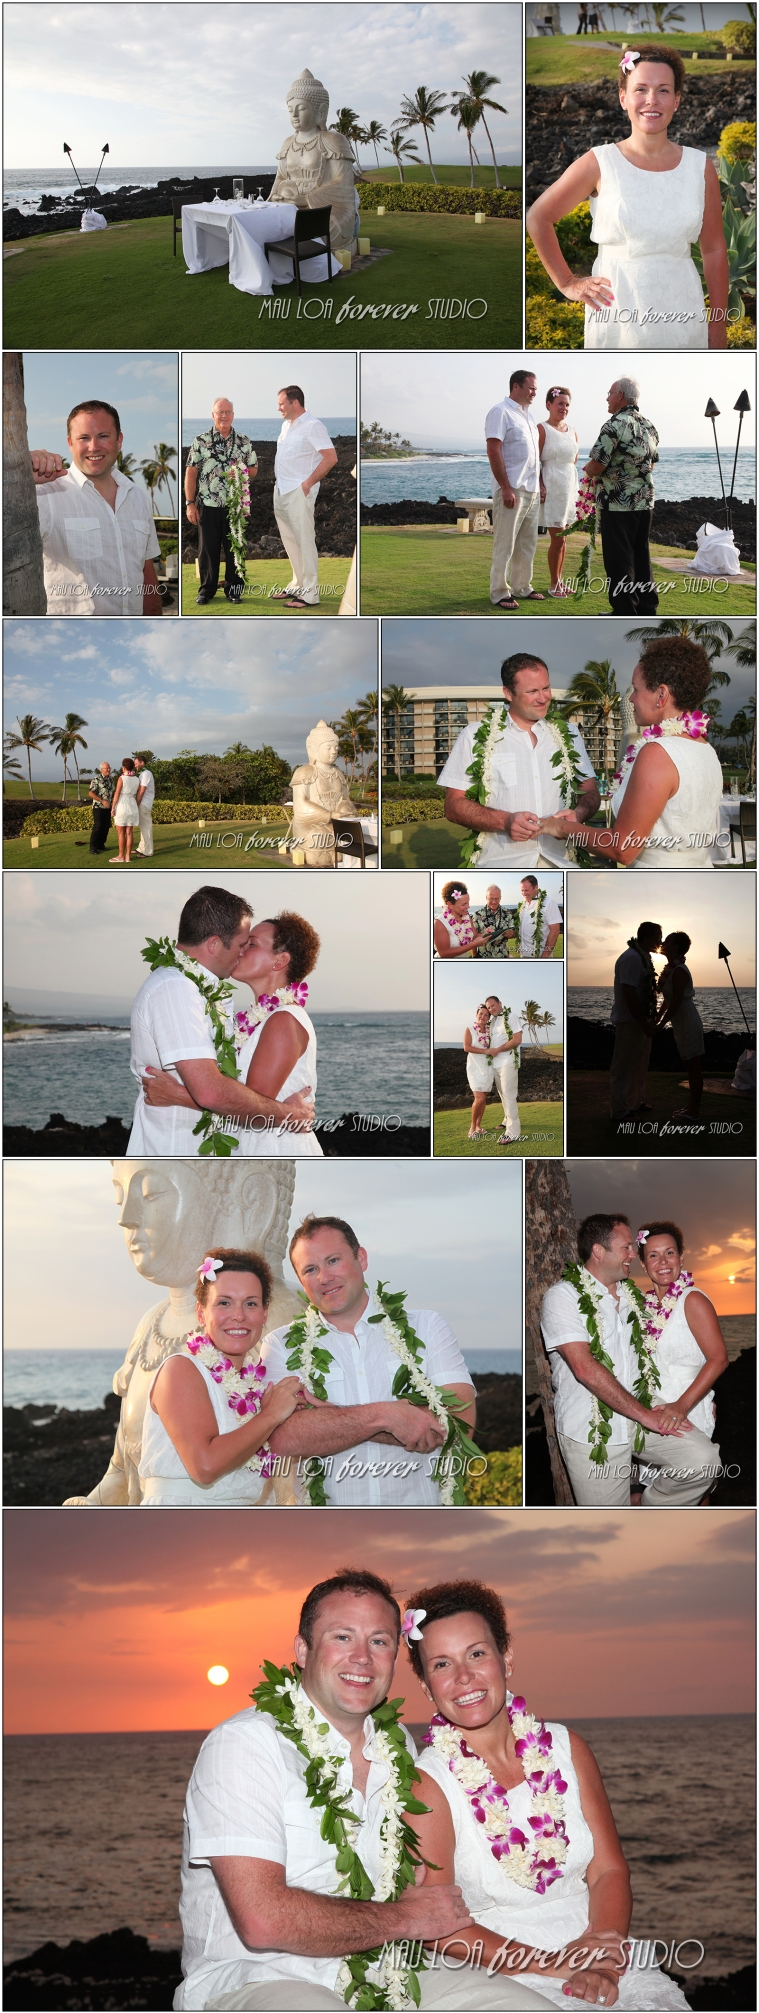 Blog-Collage-1370210238690